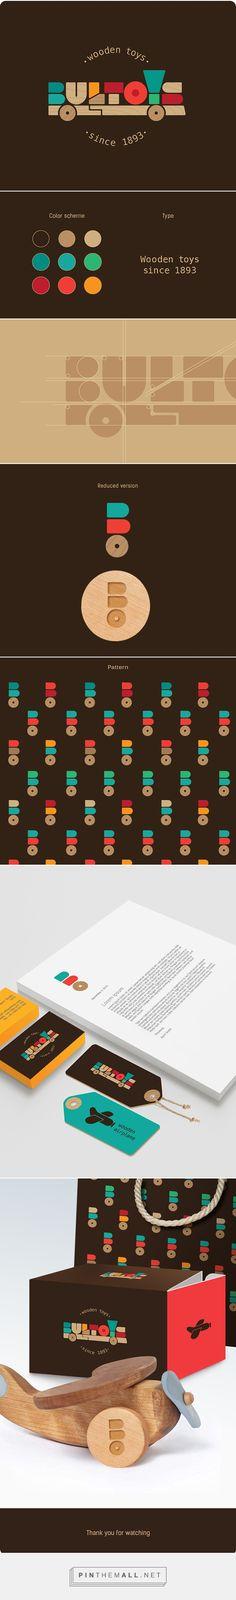 BulToys Branding by Boyko Taskov on Behance | Fivestar Branding – Design and Branding Agency & Inspiration Gallery